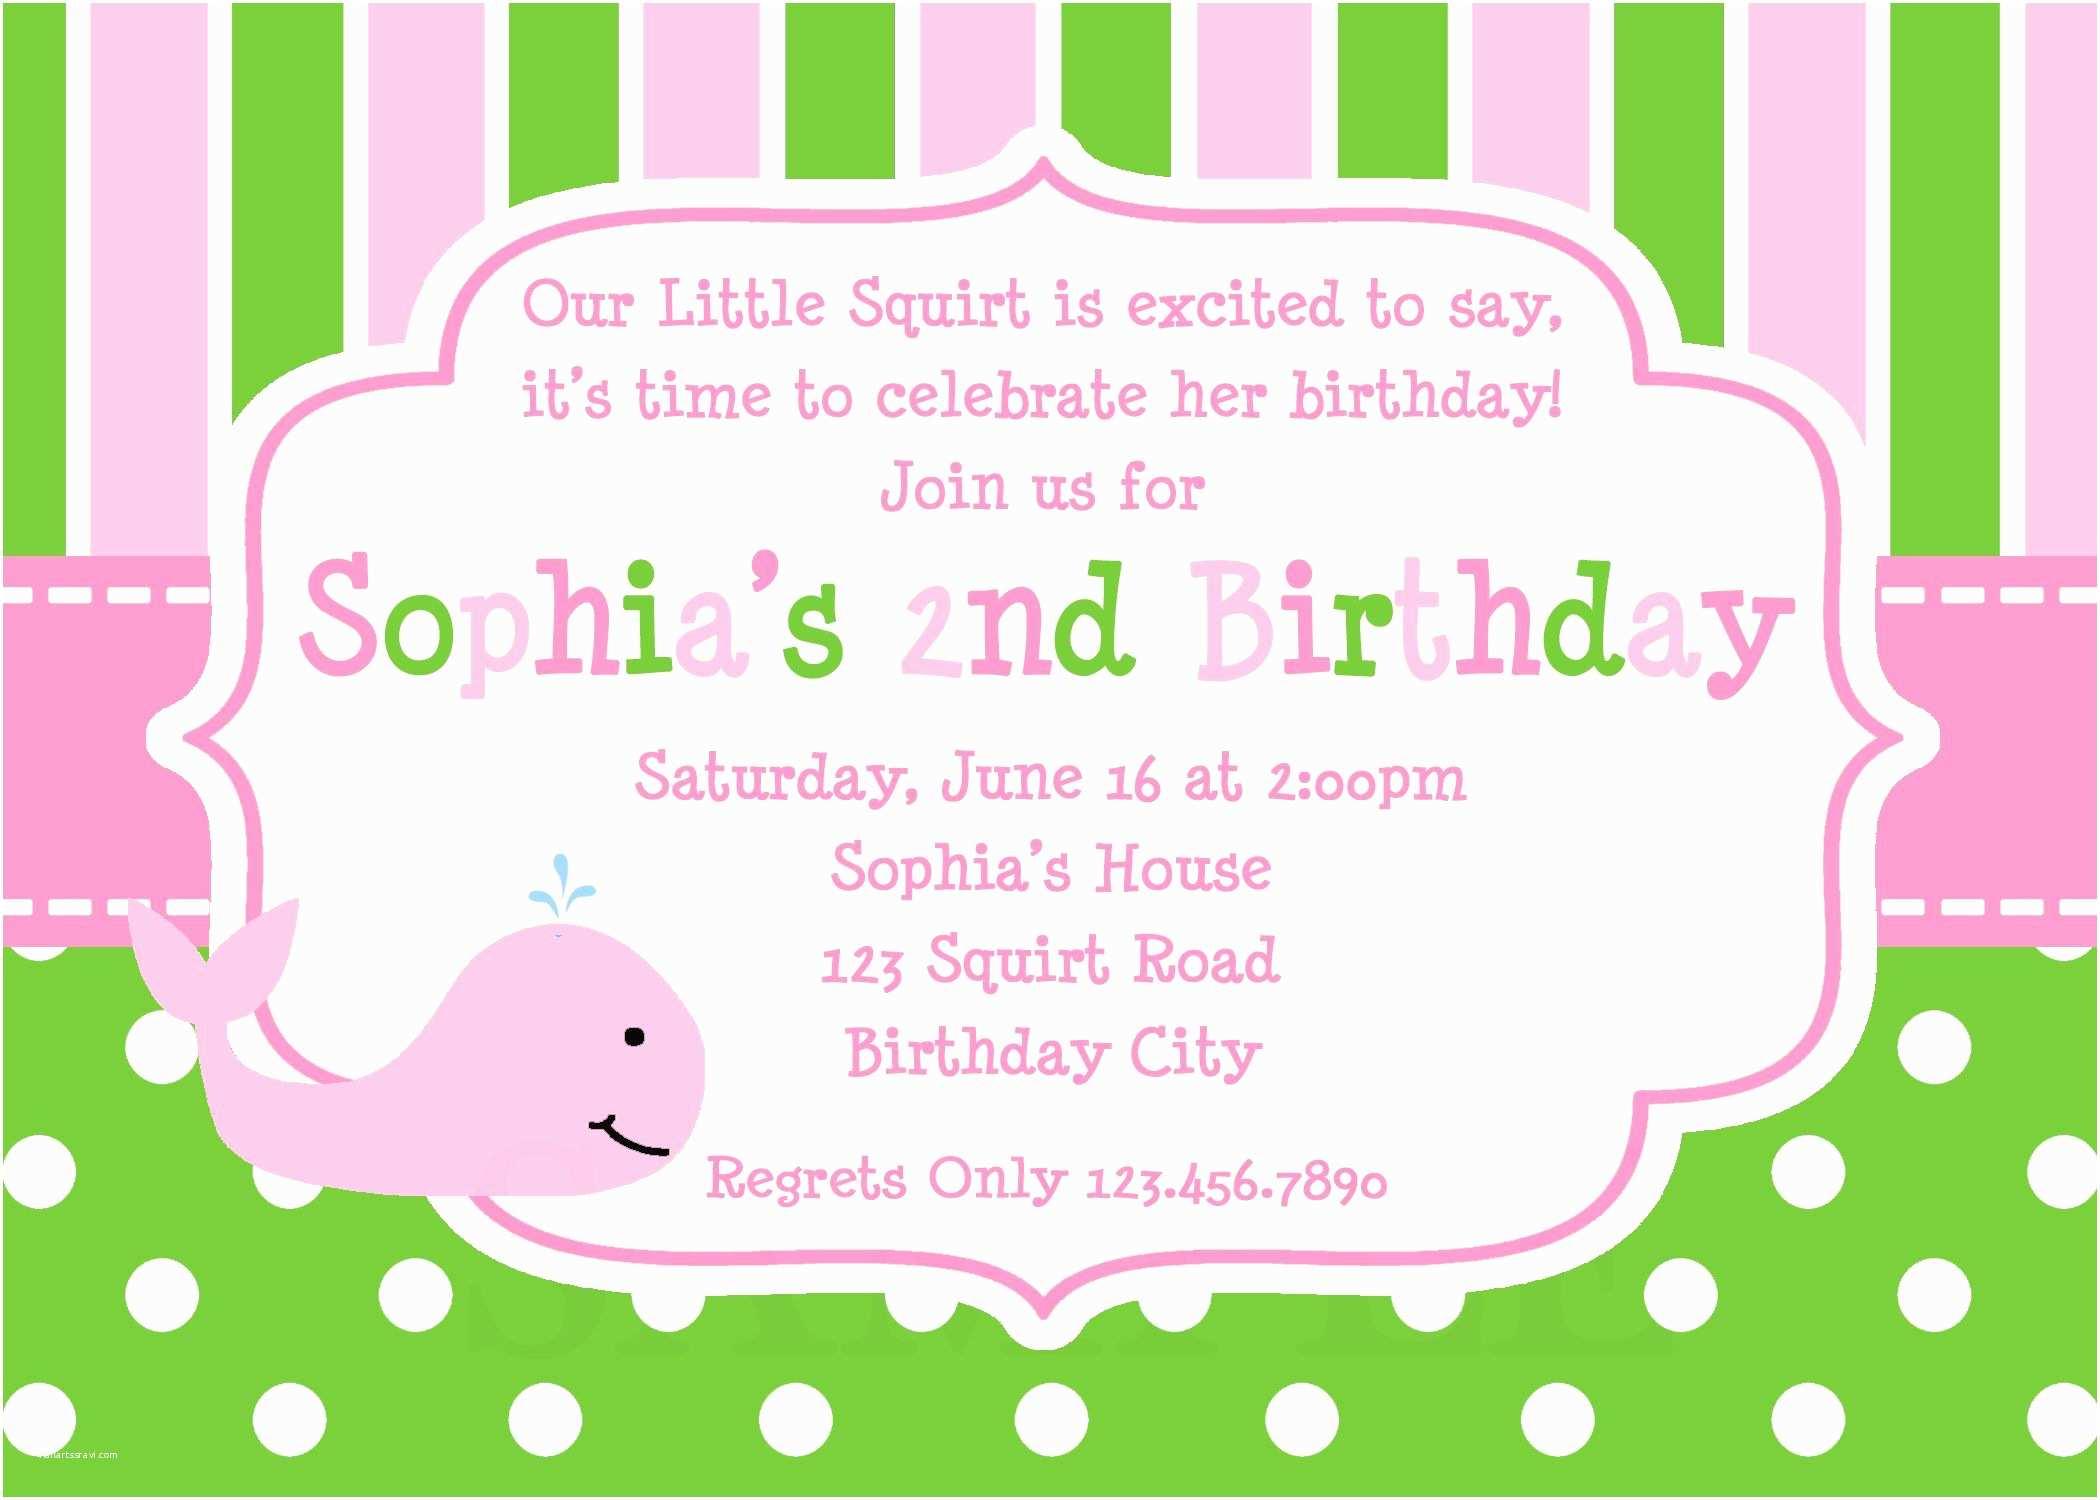 Party Invitation Wording 21 Kids Birthday Invitation Wording that We Can Make